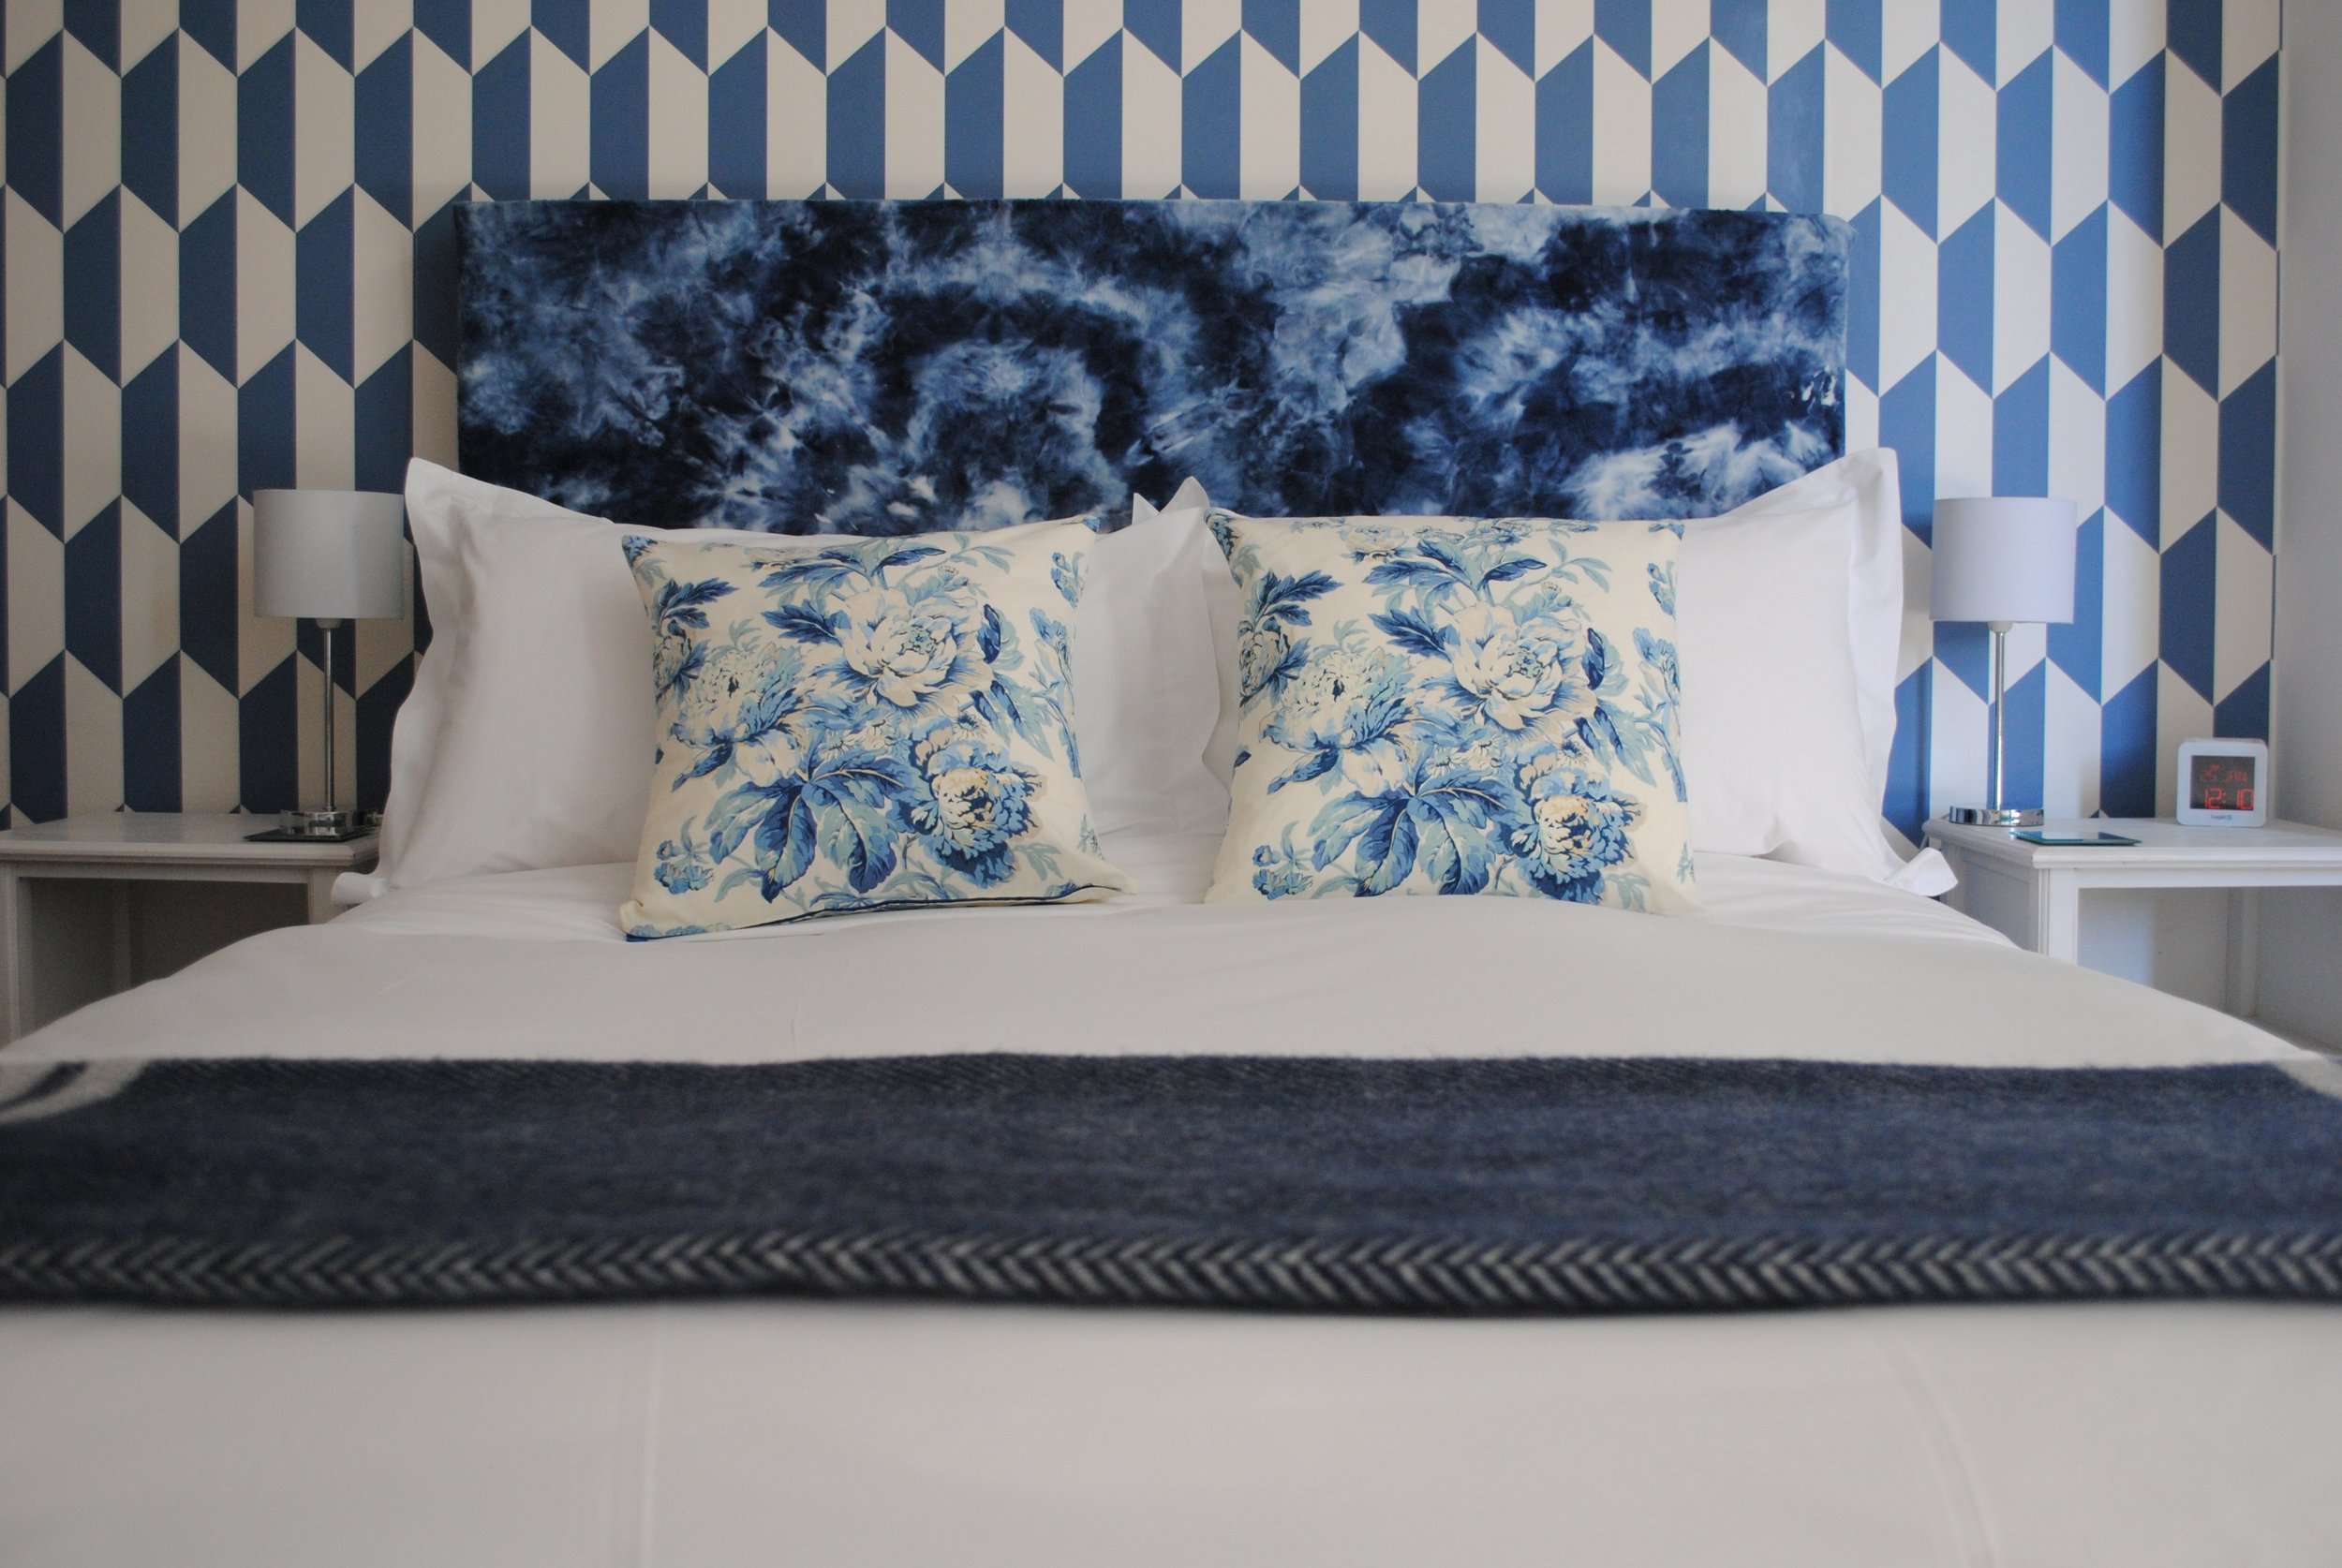 Rm3 bed 2.jpg